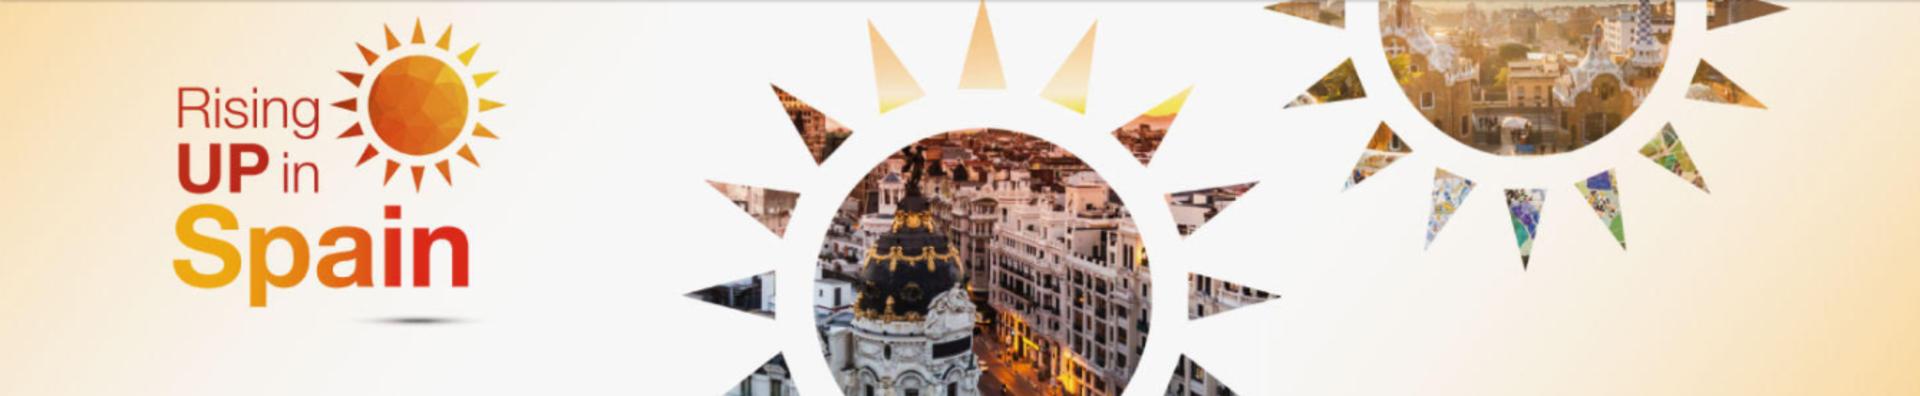 Programa de atracción de emprendedores extranjeros RISING UP IN SPAIN - ICEX – INVEST IN SPAIN.